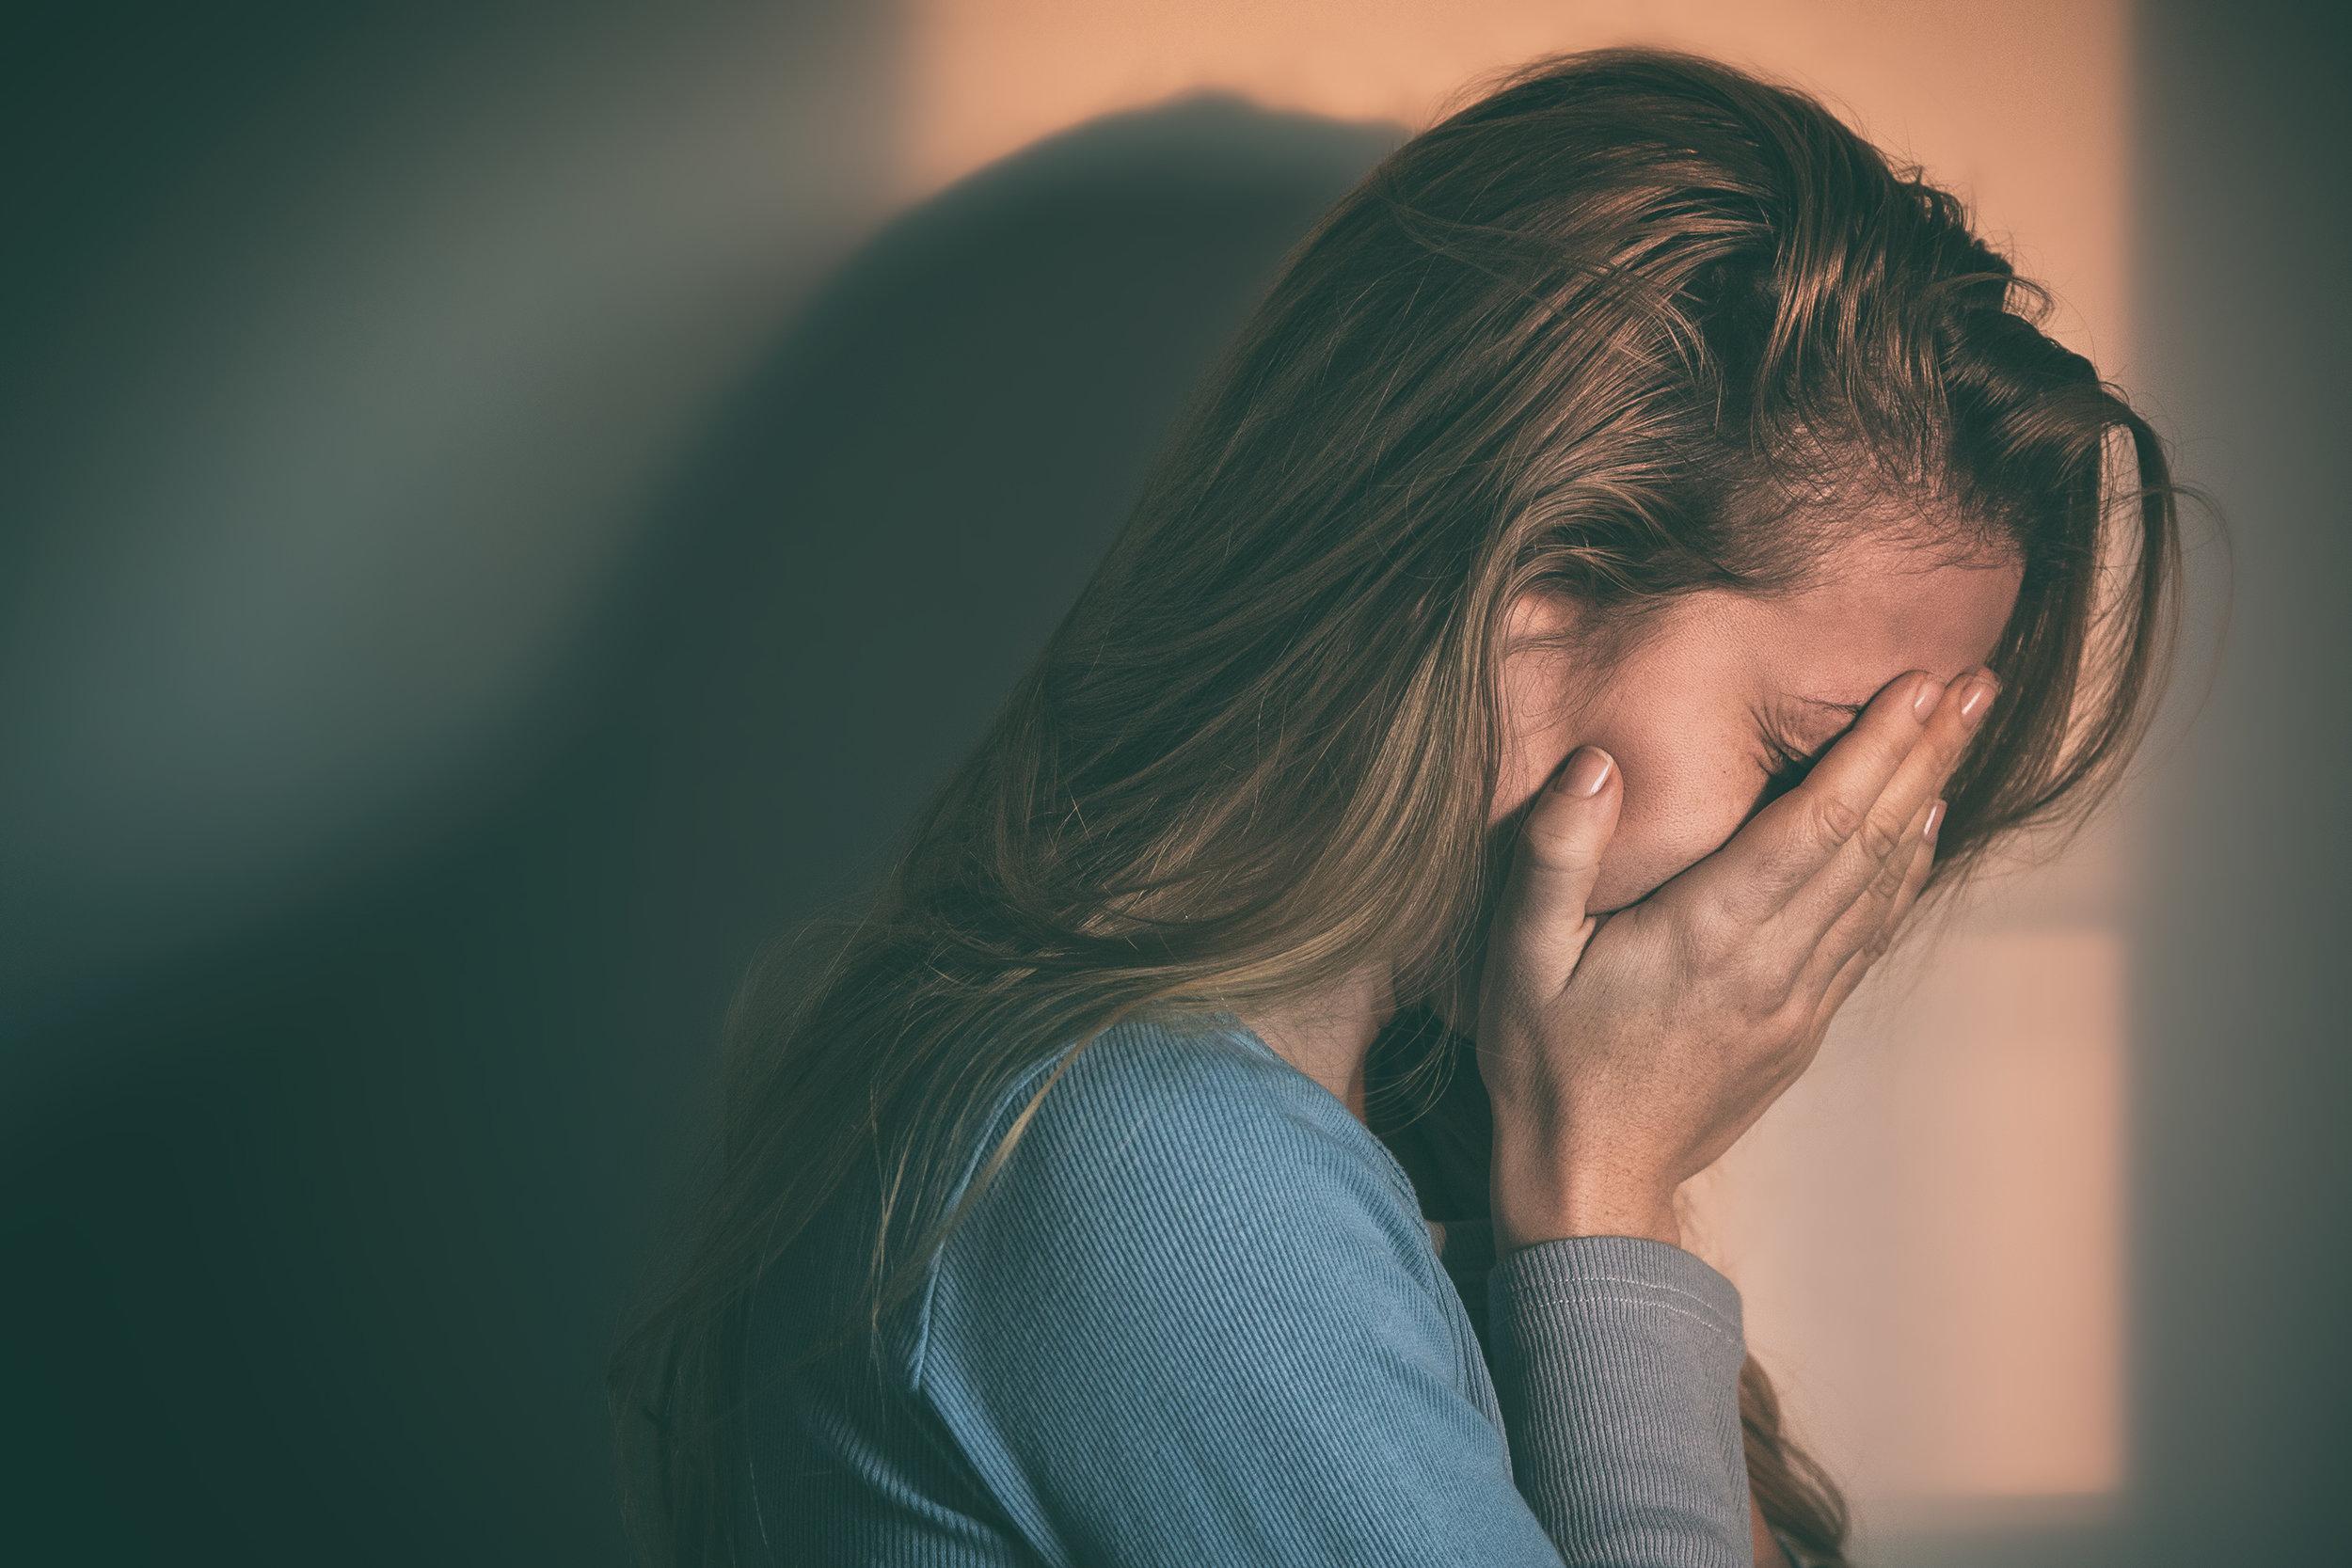 denver trauma therapy ptsd